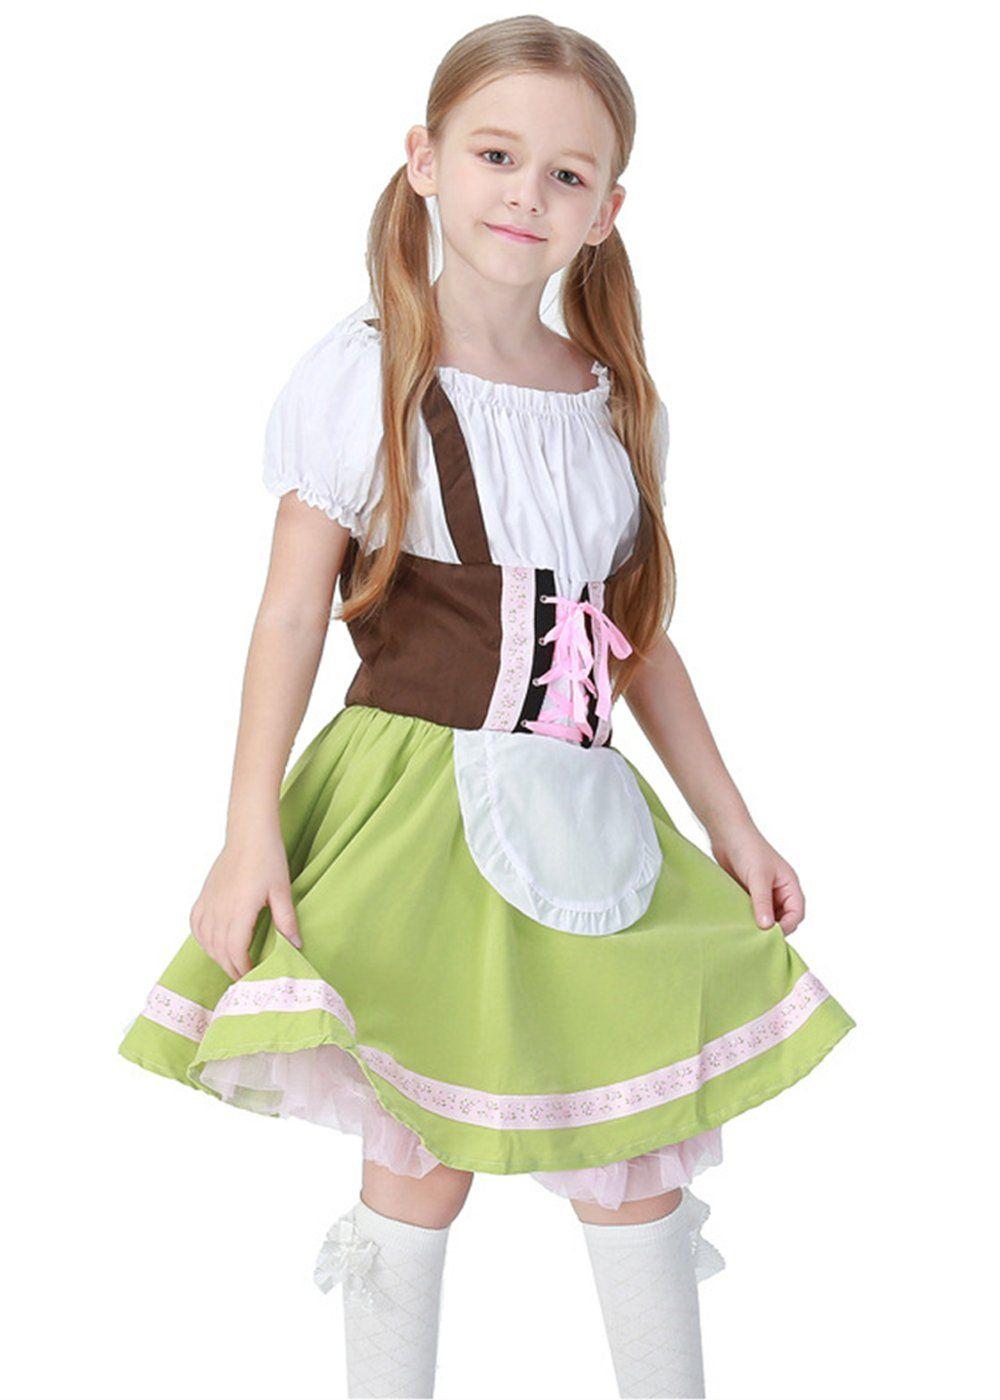 Boys Bavarian German National Dress Oktoberfest Fancy Dress Costume Child Outfit